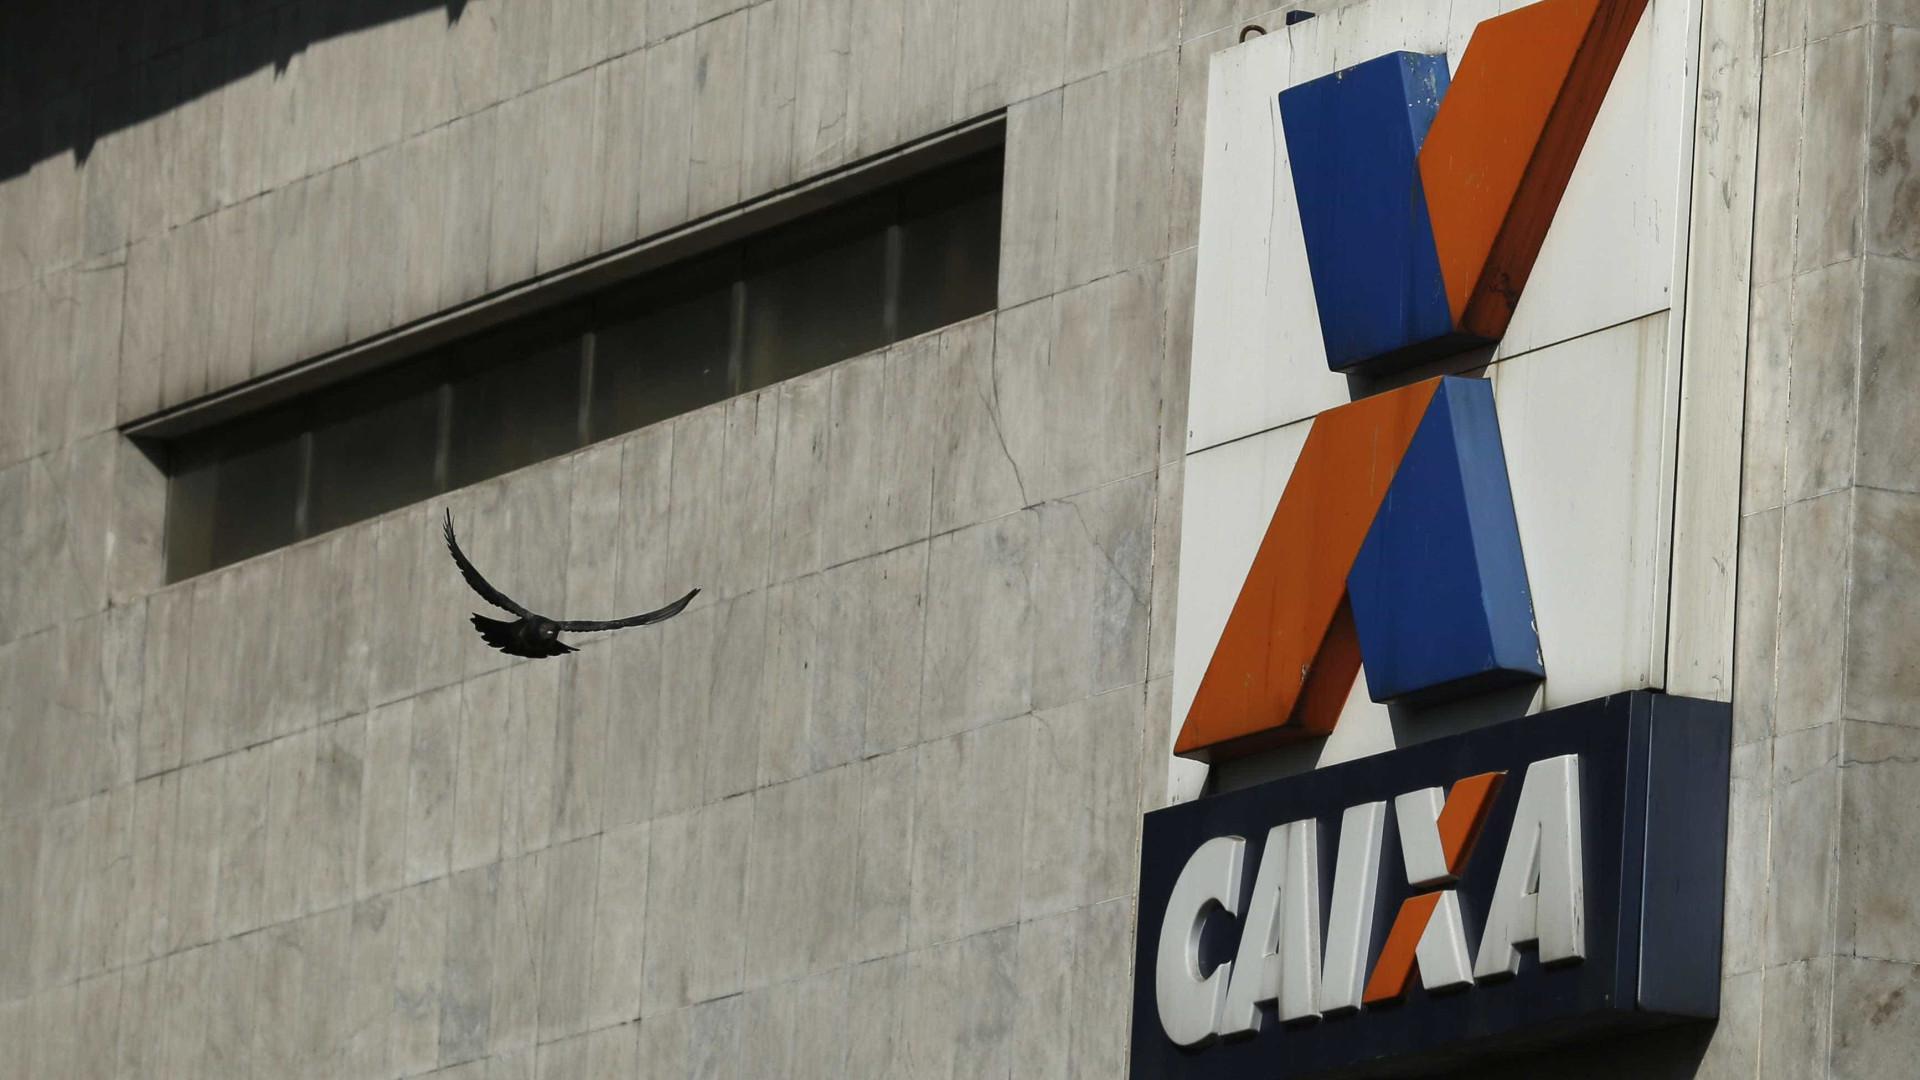 Caixa  propõe que todo o lucro de 2017 fique com o banco